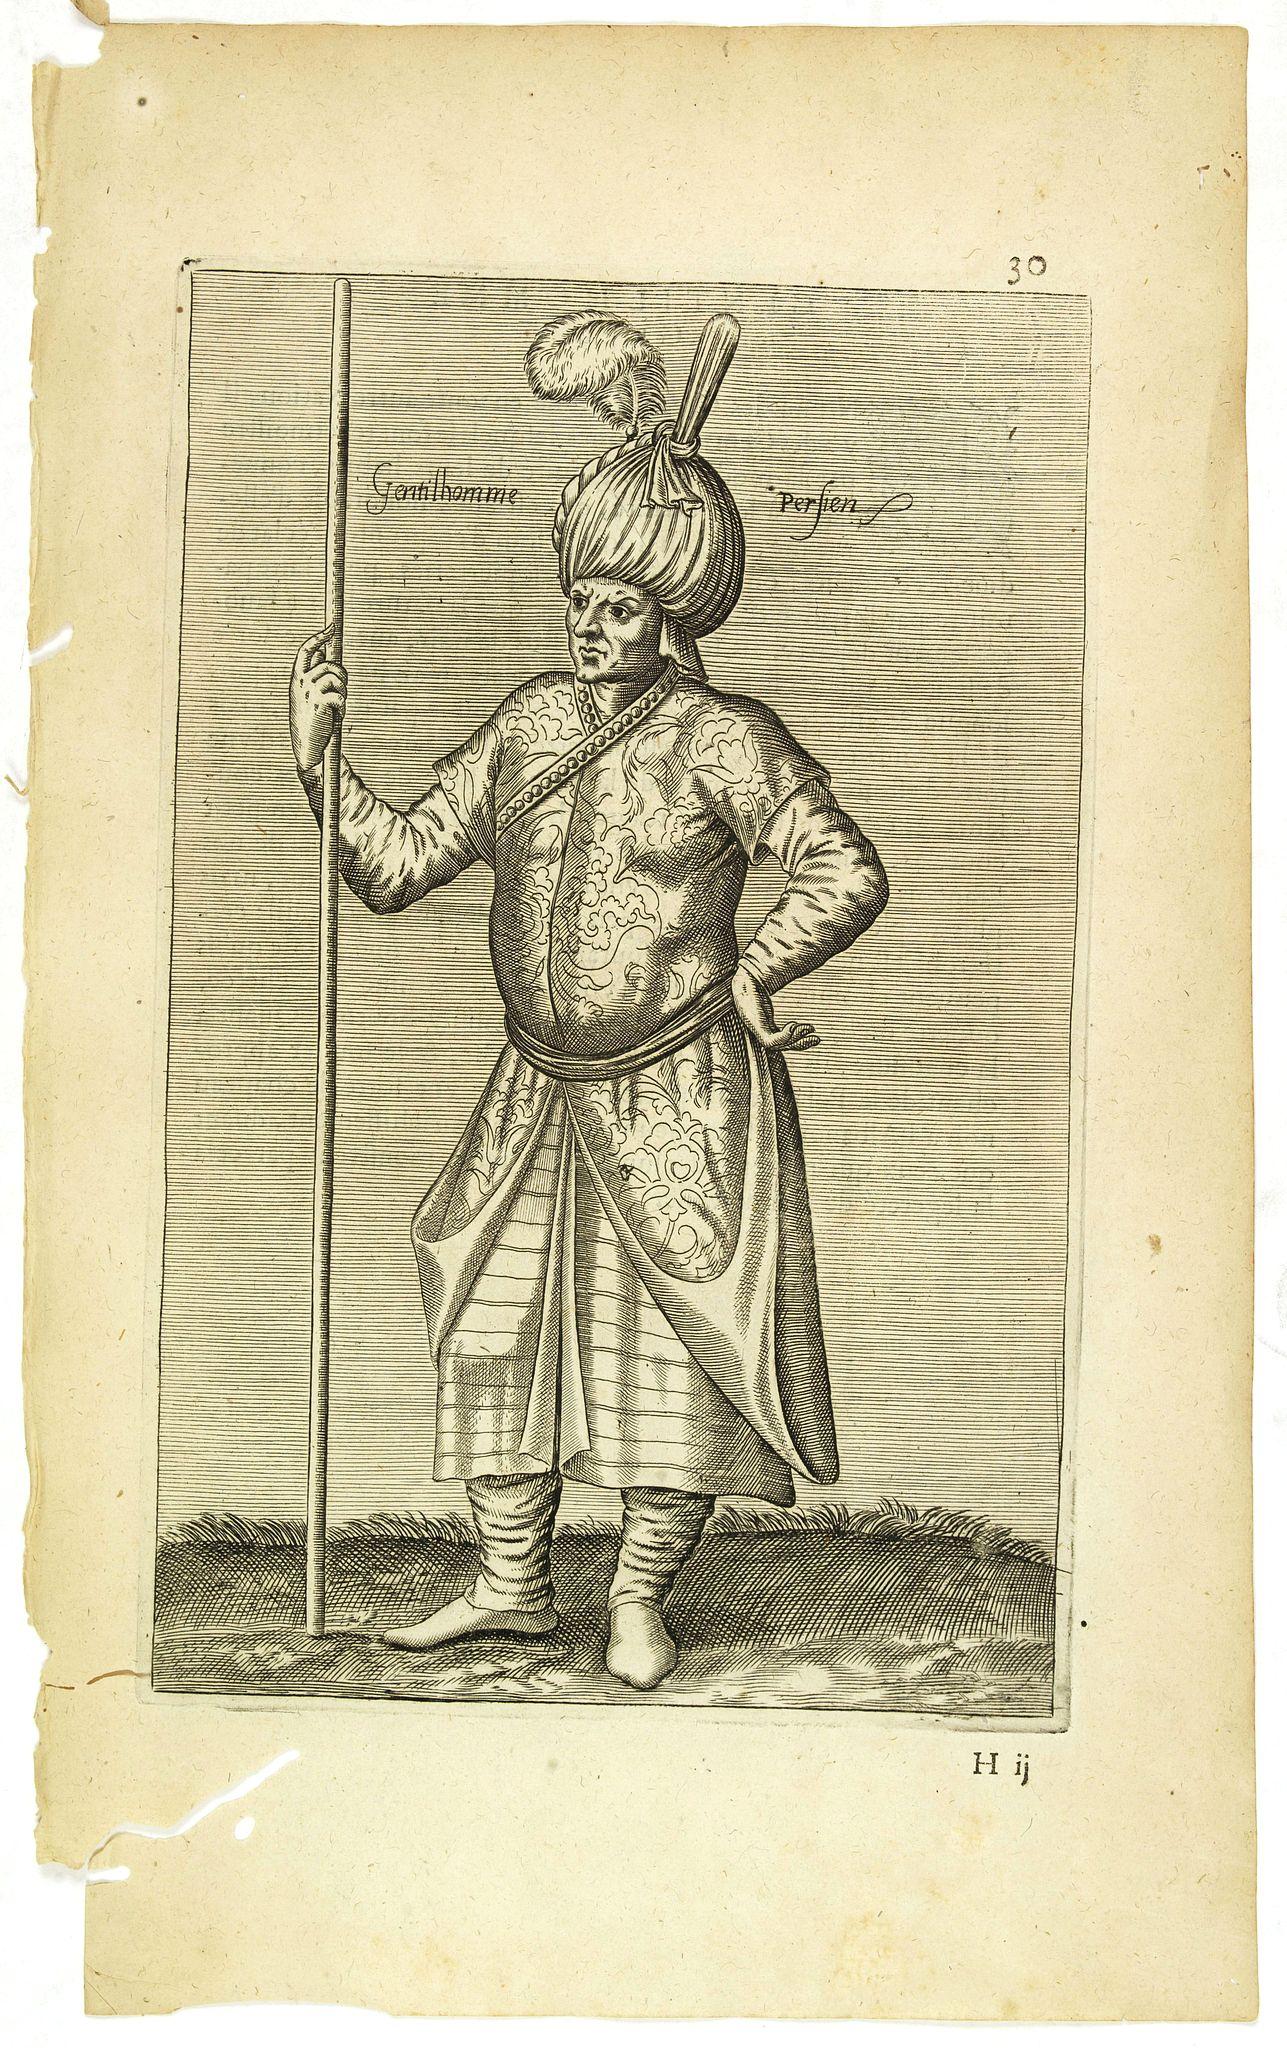 NICOLAS DE NICOLAY, Thomas Artus (sieur d'Embry). -  Gentilhomme Persien. (30)